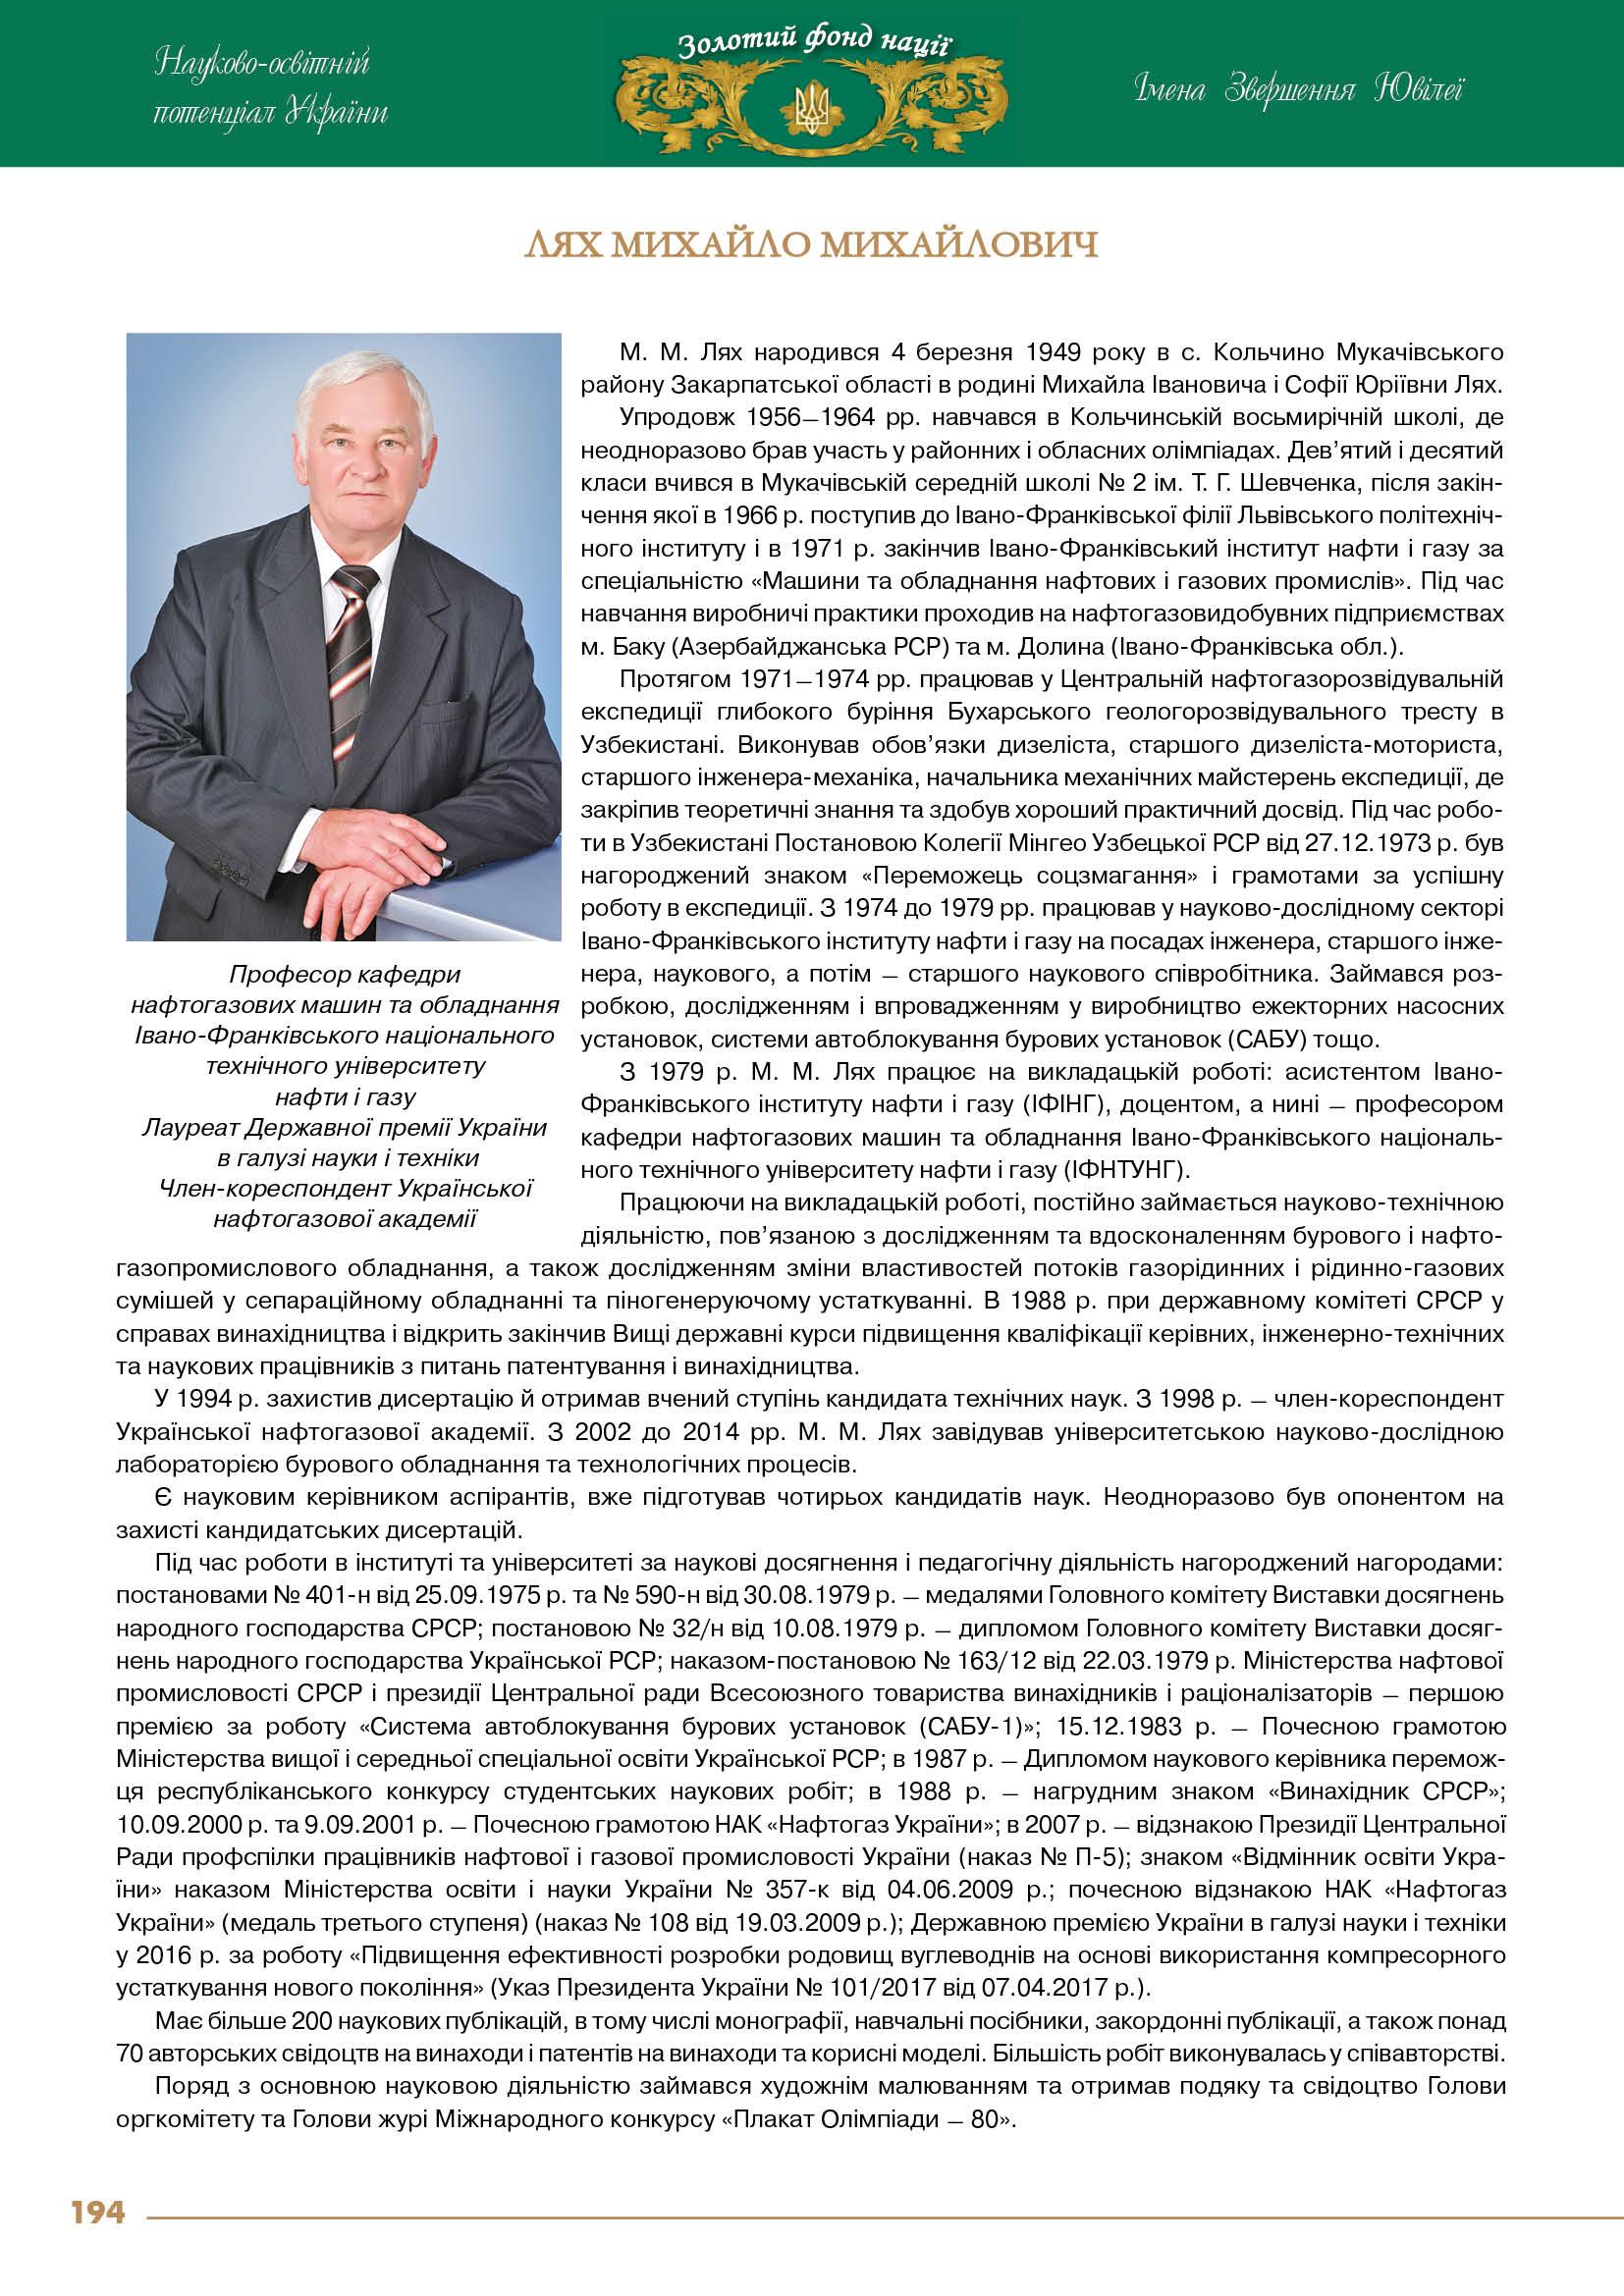 Лях Михайло Михайлович